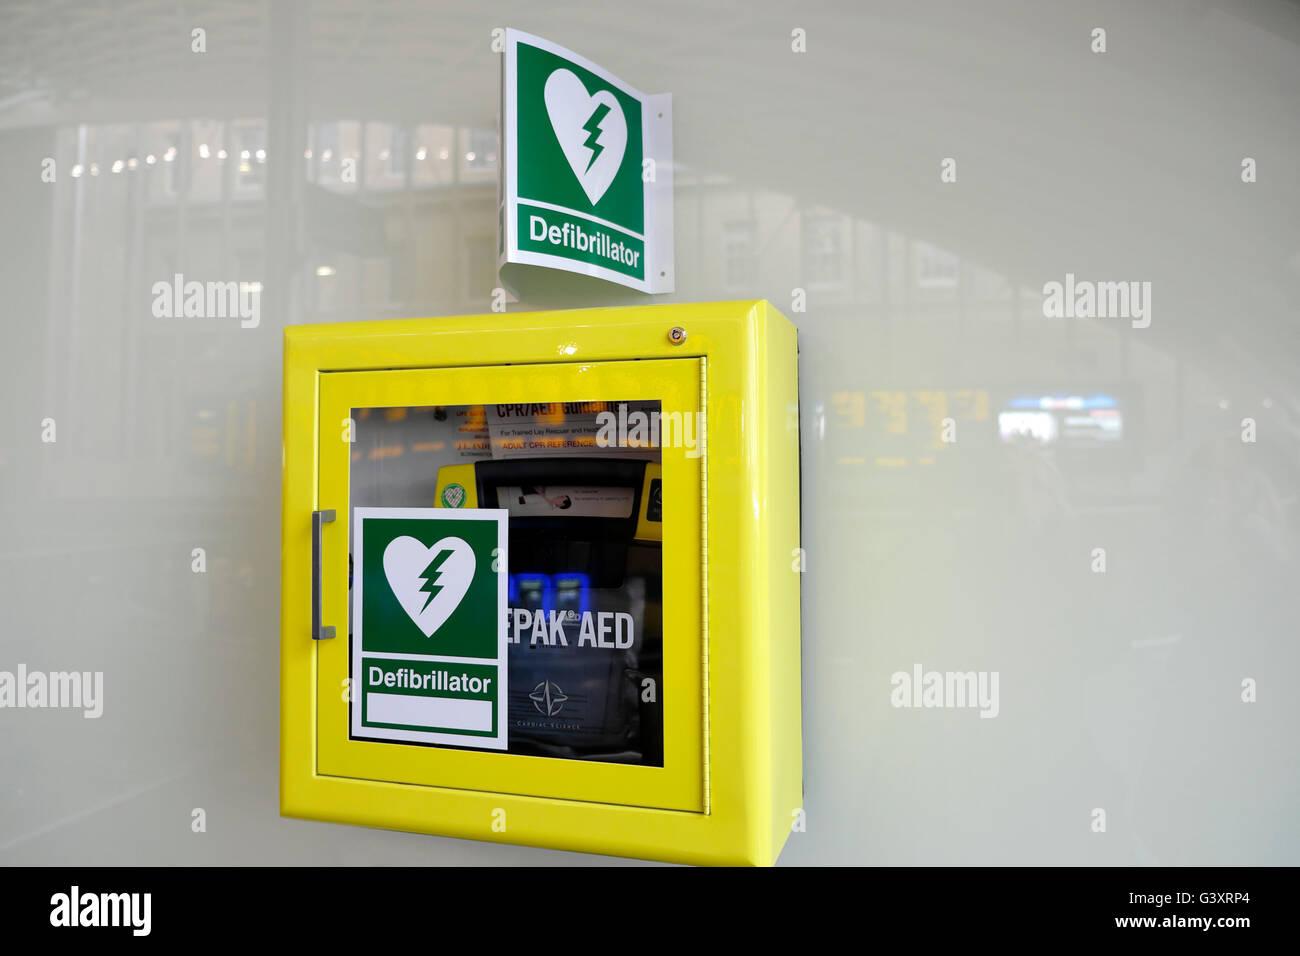 Medical Defibrillator Stock Photos & Medical Defibrillator Stock ...